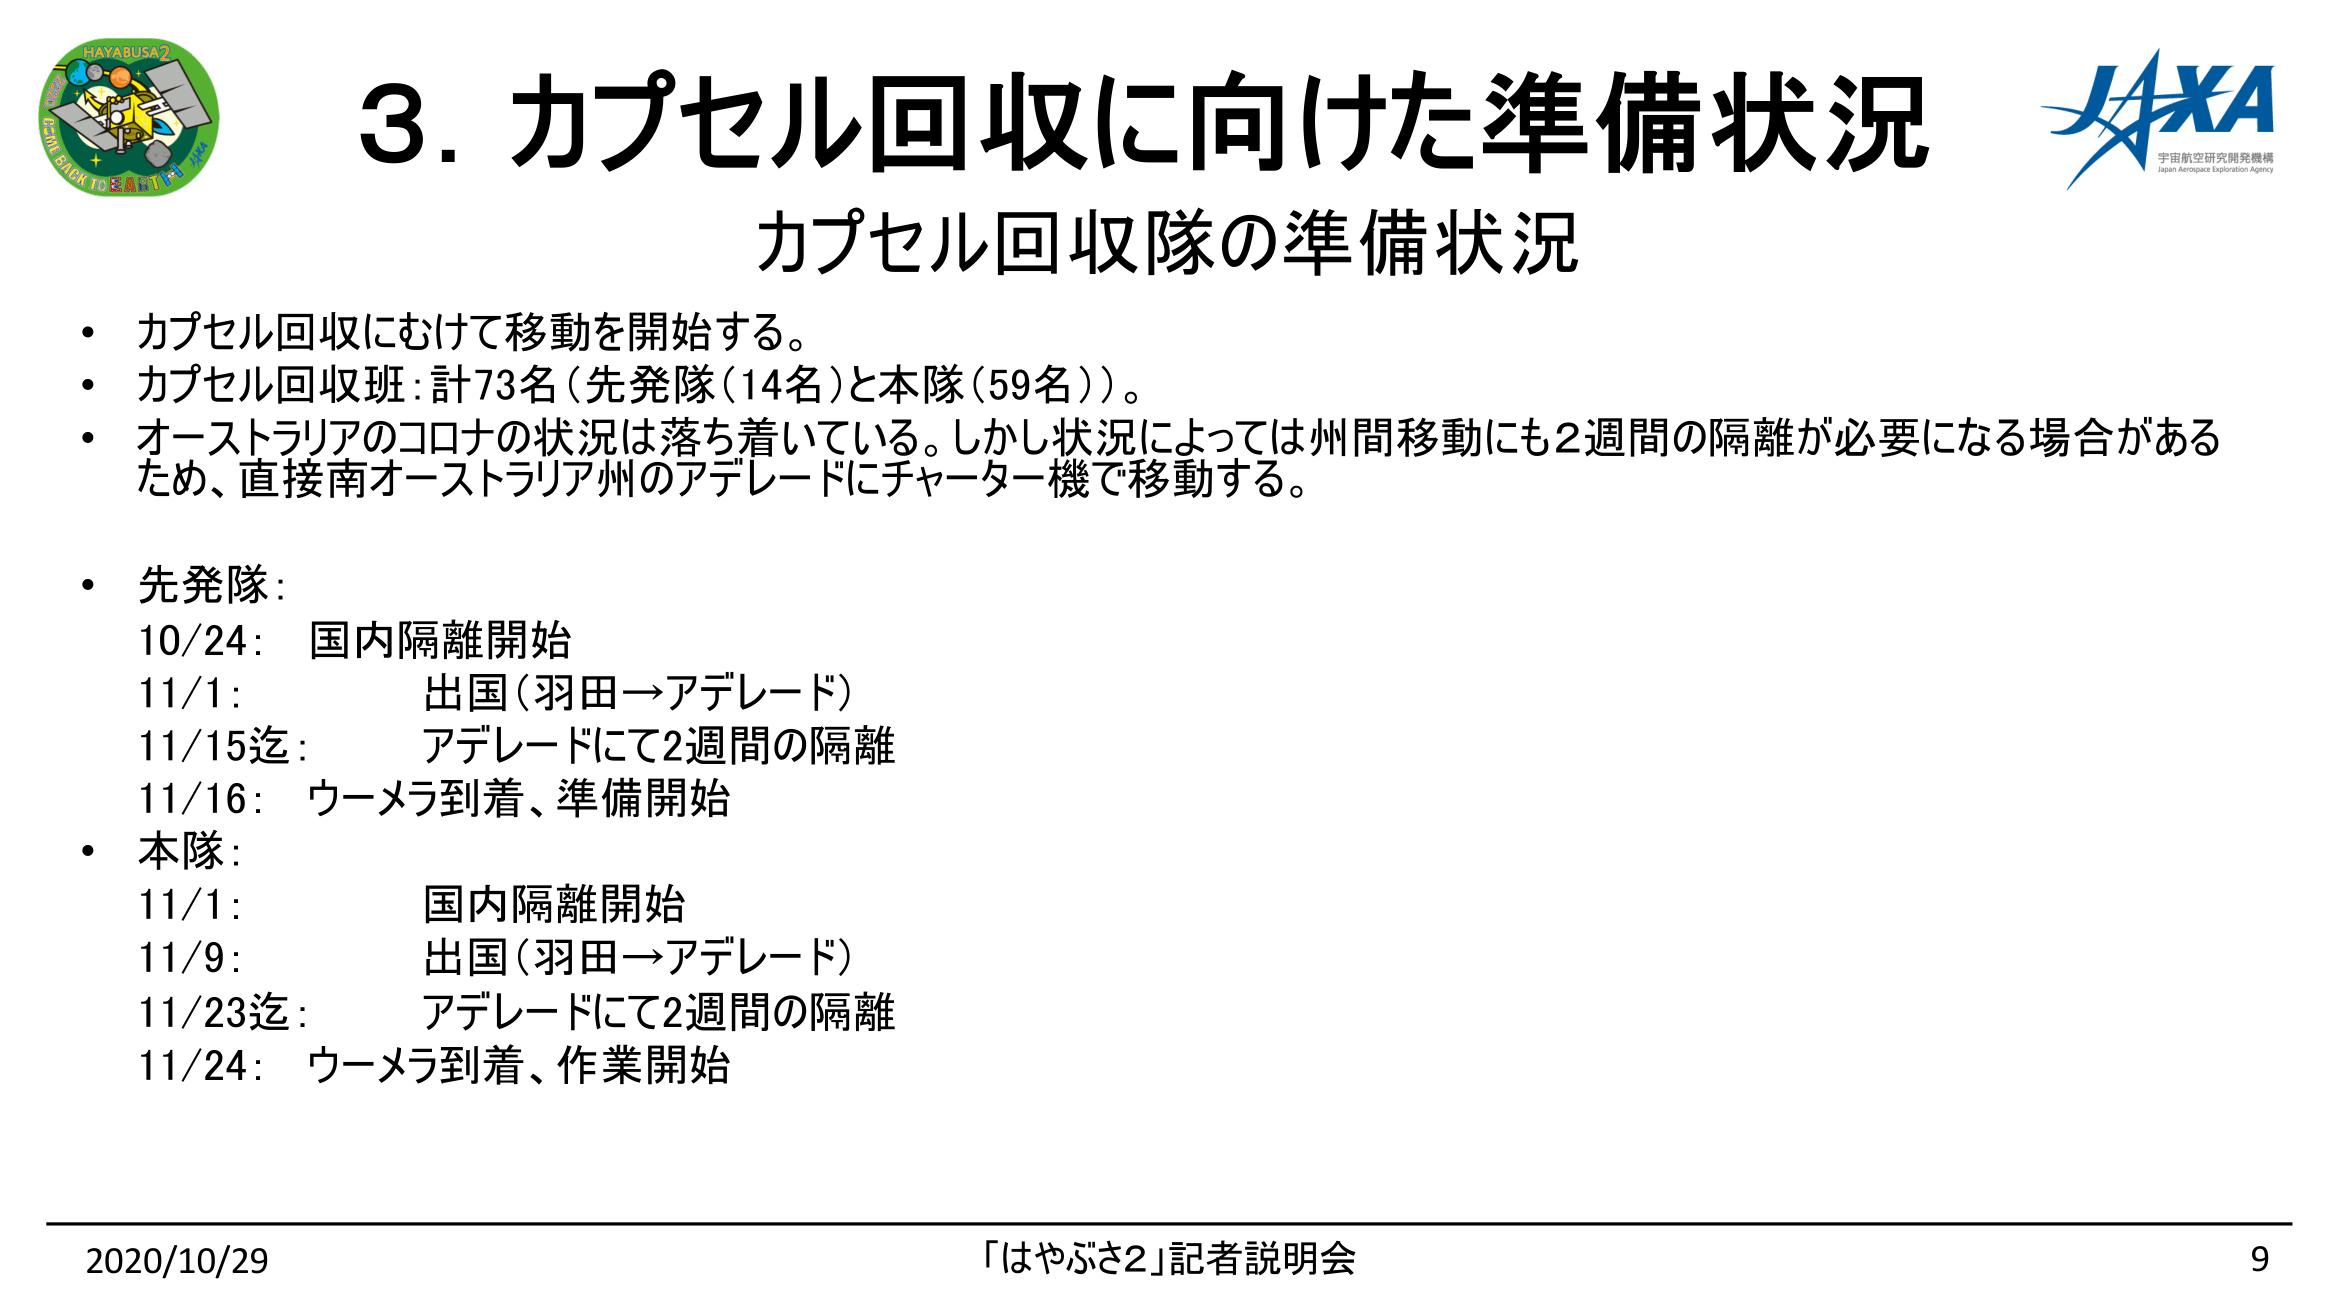 f:id:Imamura:20201029161312p:plain